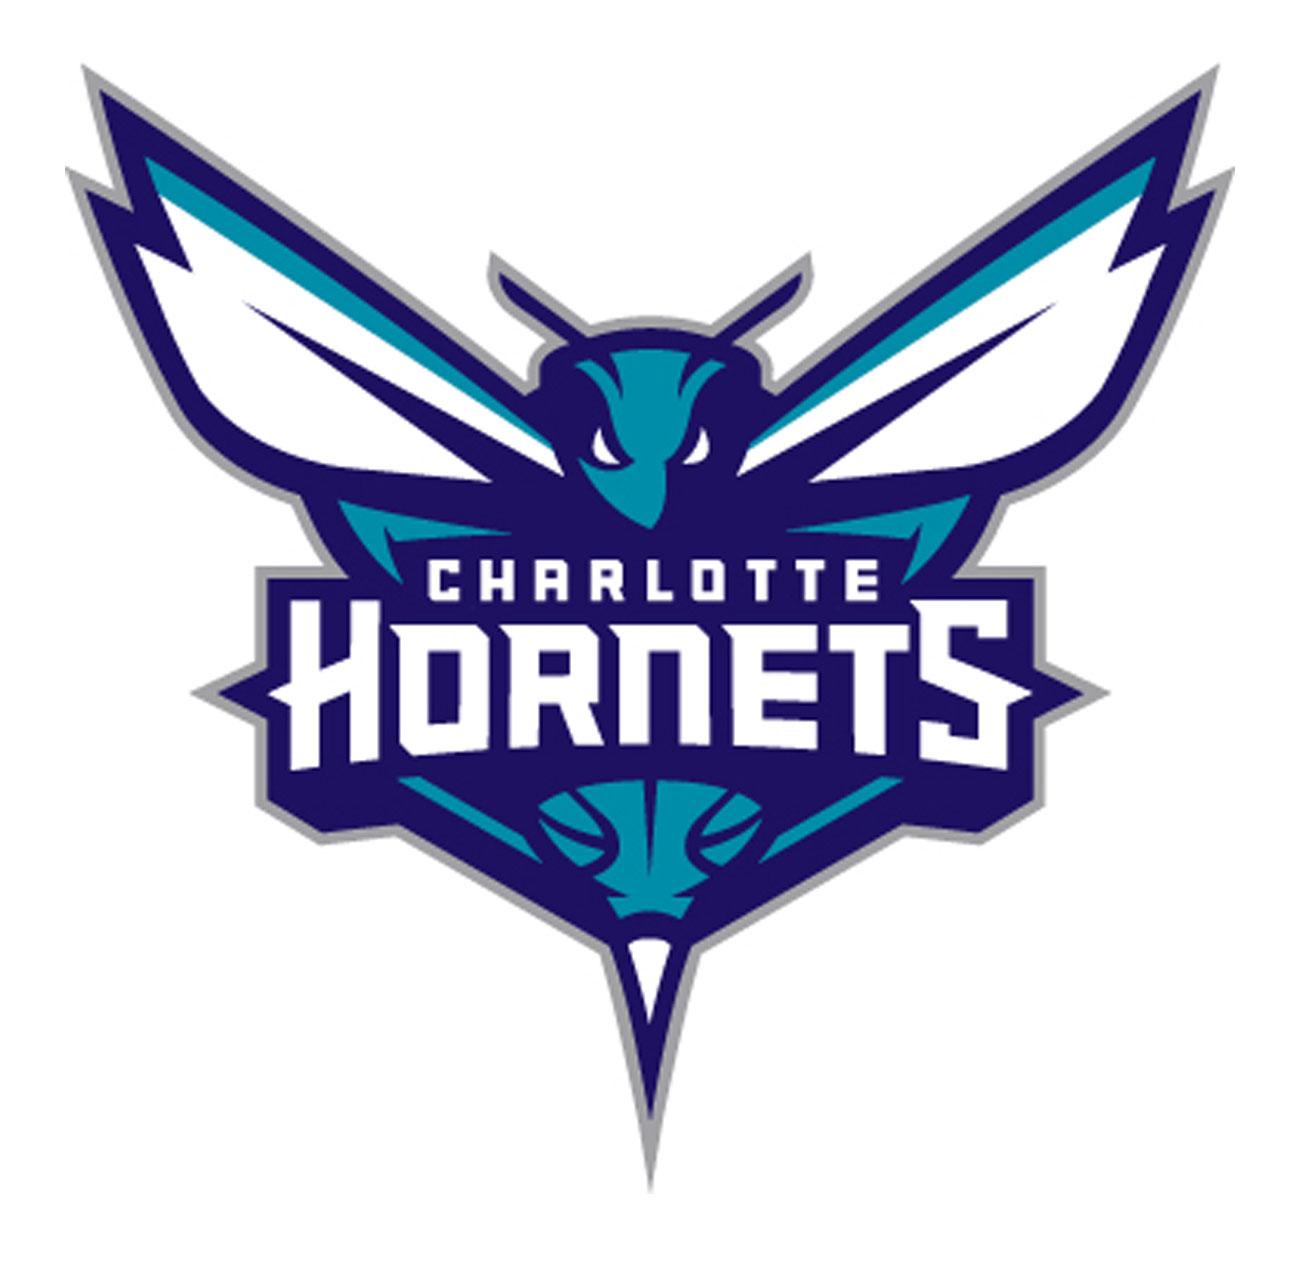 Charlotte Bobcats unveil new Hornets logo